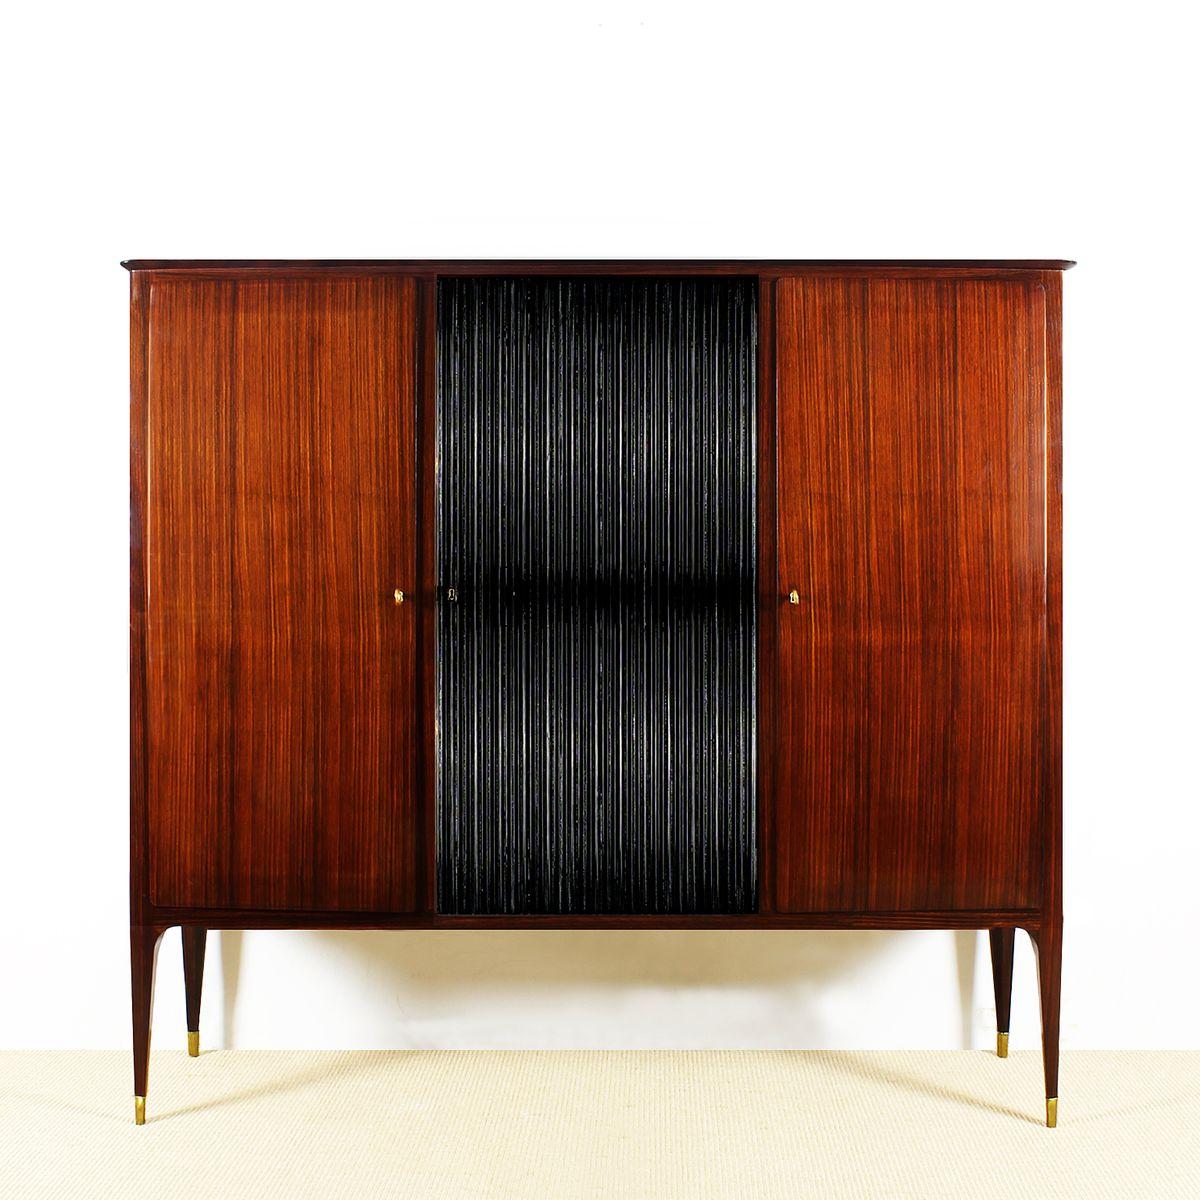 Barschrank von mobili d 39 arte cant 1940er bei pamono kaufen - Mobili d arte ...